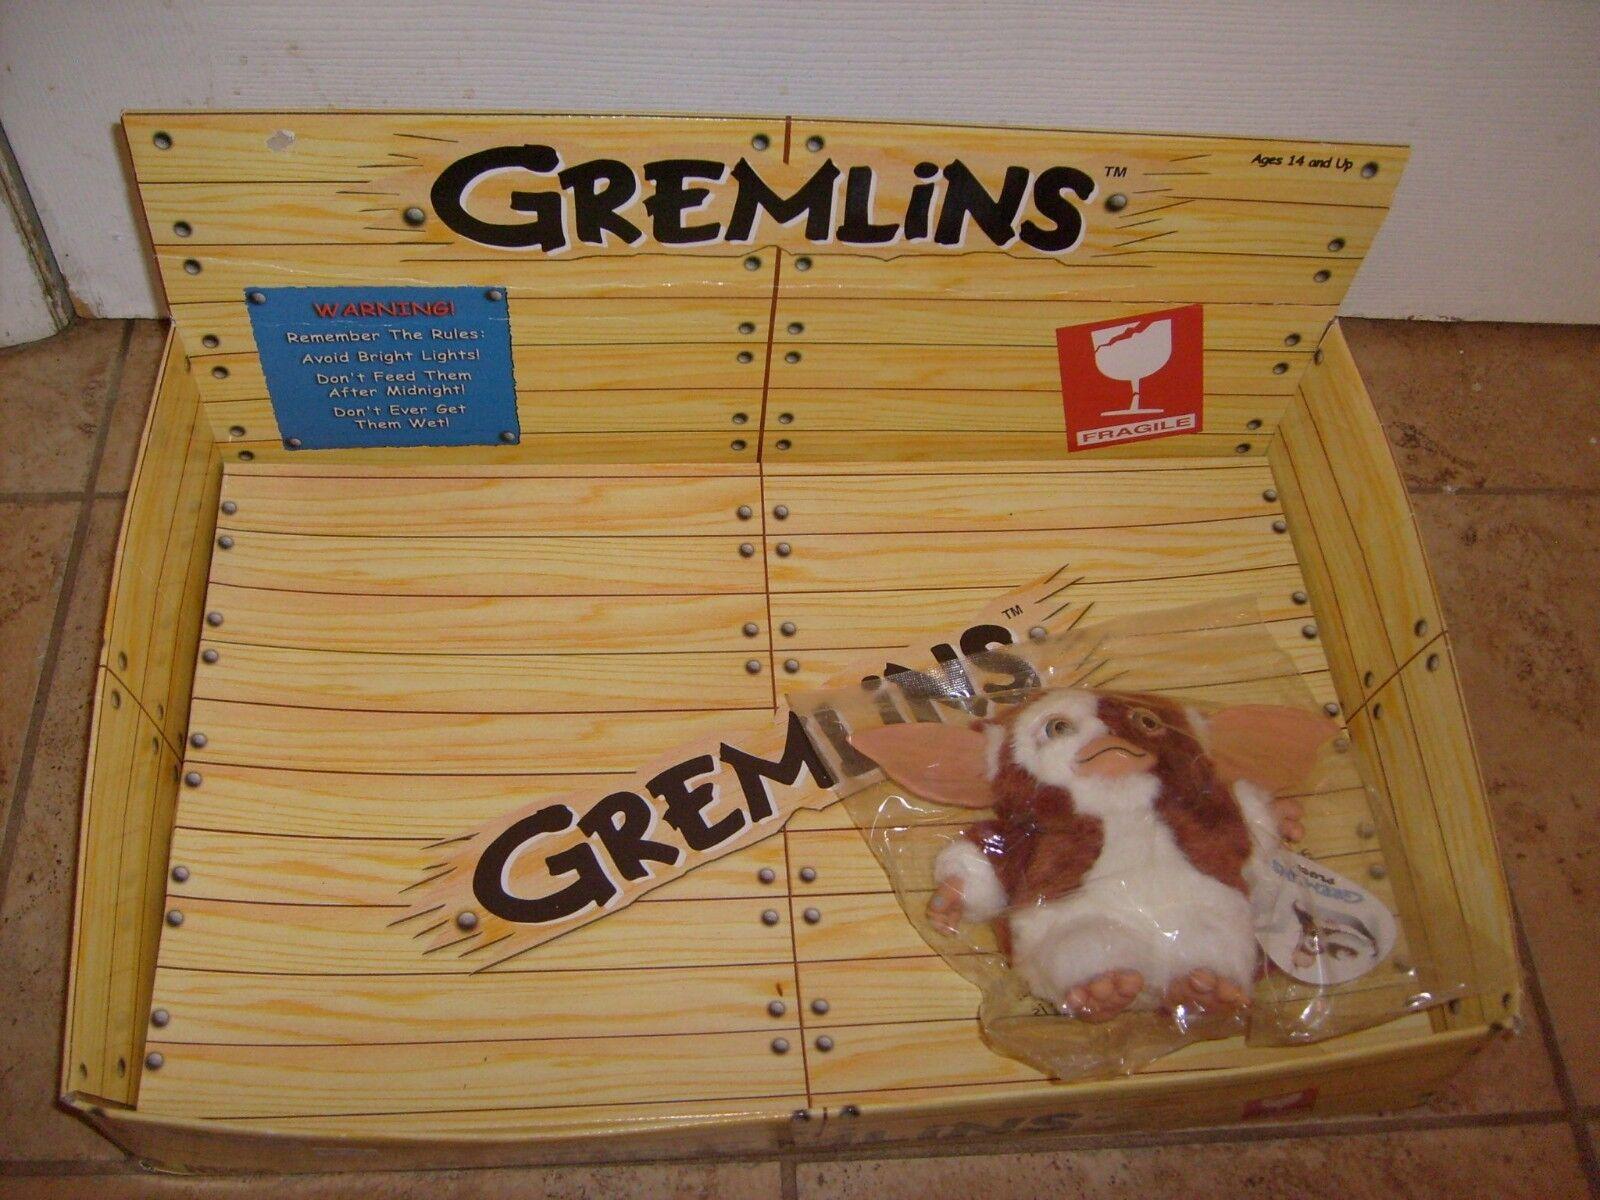 GREMLINS GIZMO 6  MOVIE MOVIE MOVIE NECA PLUSH FIGURE NEW WITH RARE STORE DISPLAY 0c8f8a